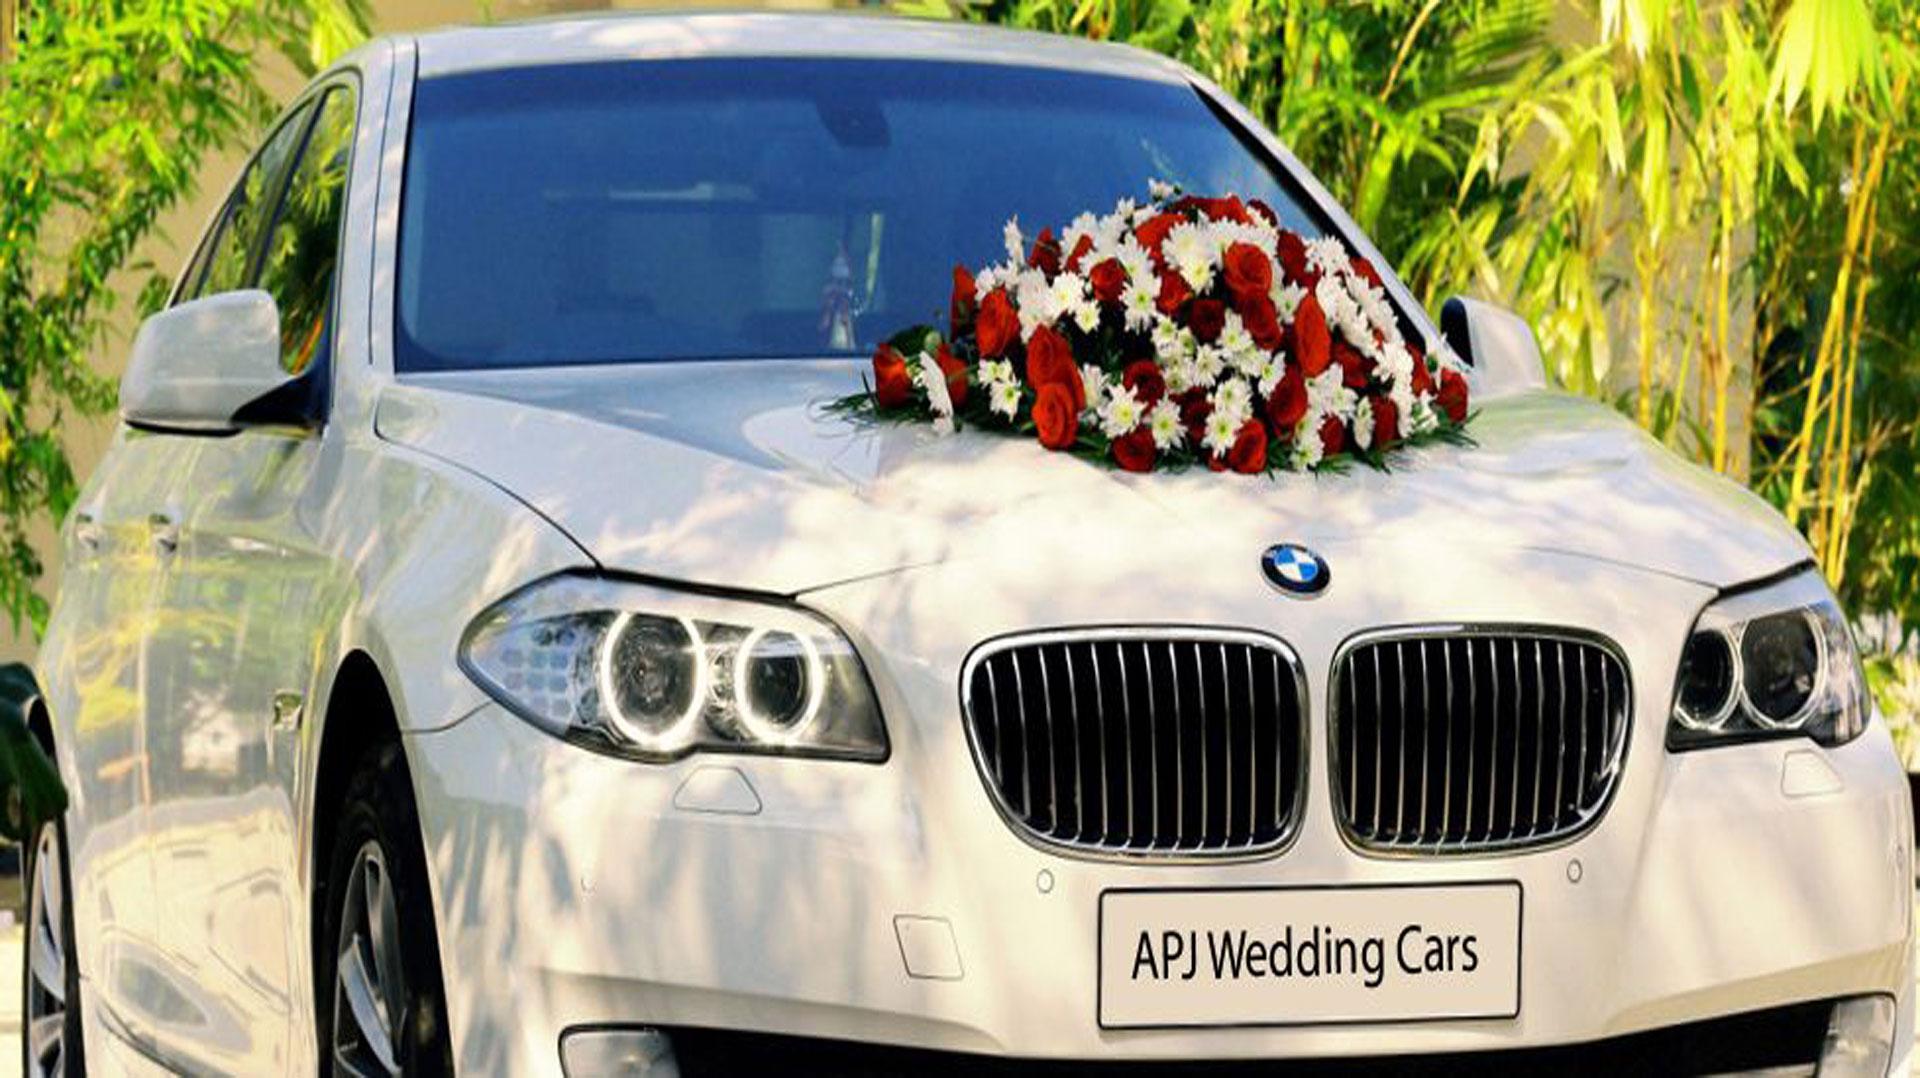 Car Rental Bridal Cars Chennai Premium Car Rentals Hire